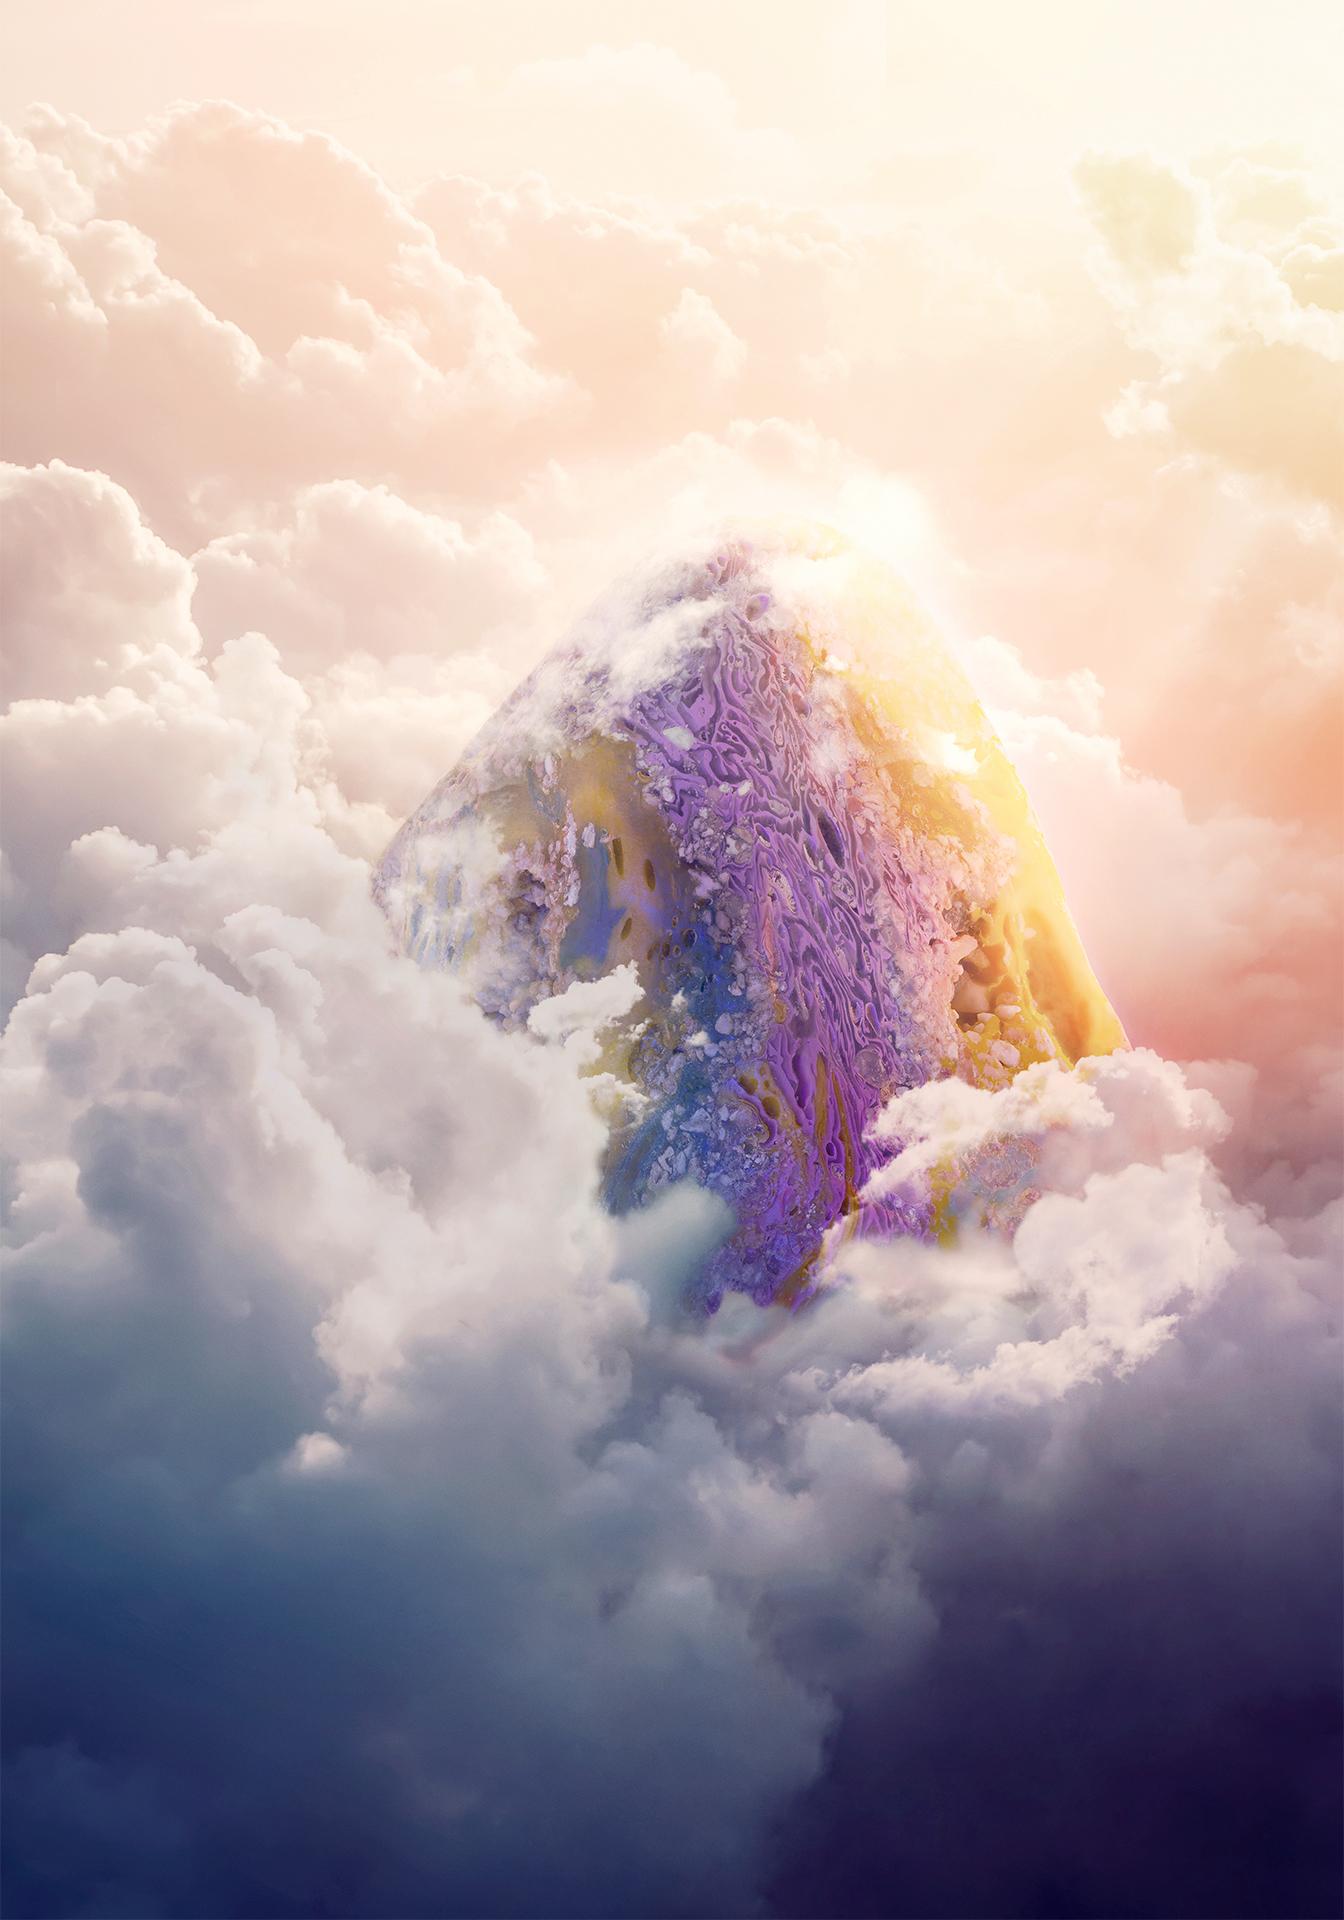 The Cool Couple, Karma Fails, Meditation Rocks®, Air   2017, Diasec® 4+3 mm, cm 100 x 70